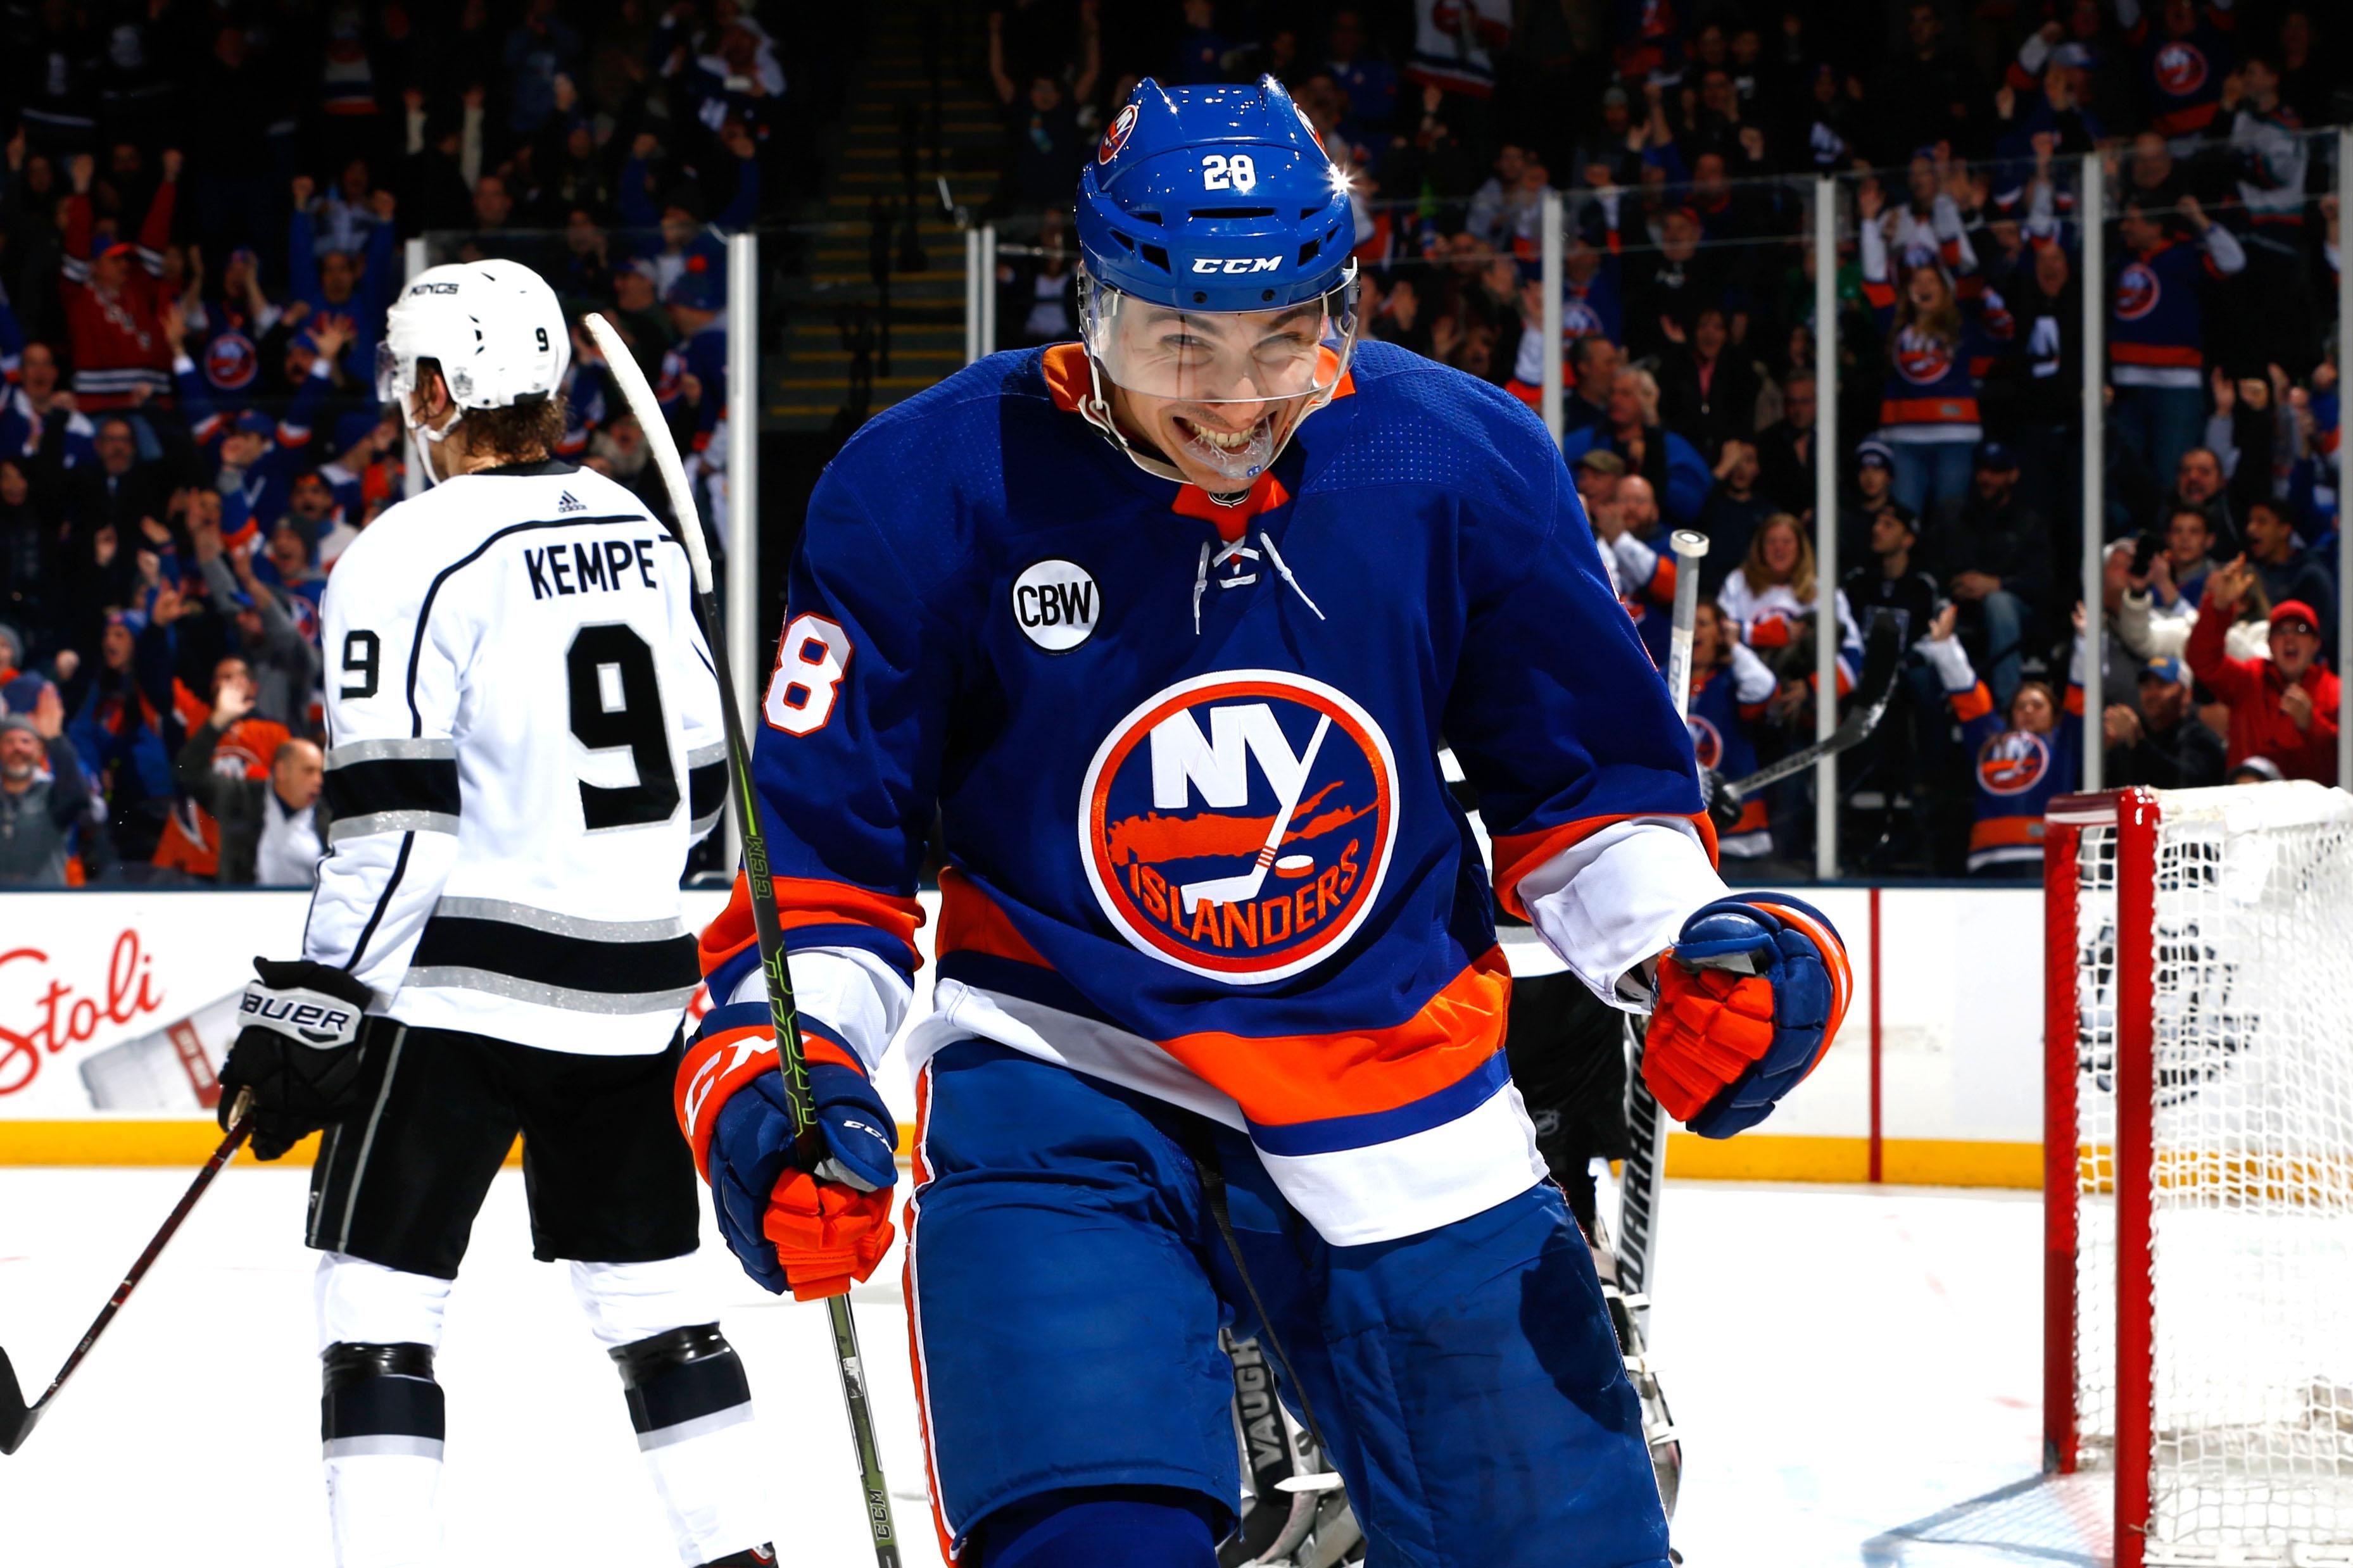 Islanders put in the work to earn nice bounce-back win